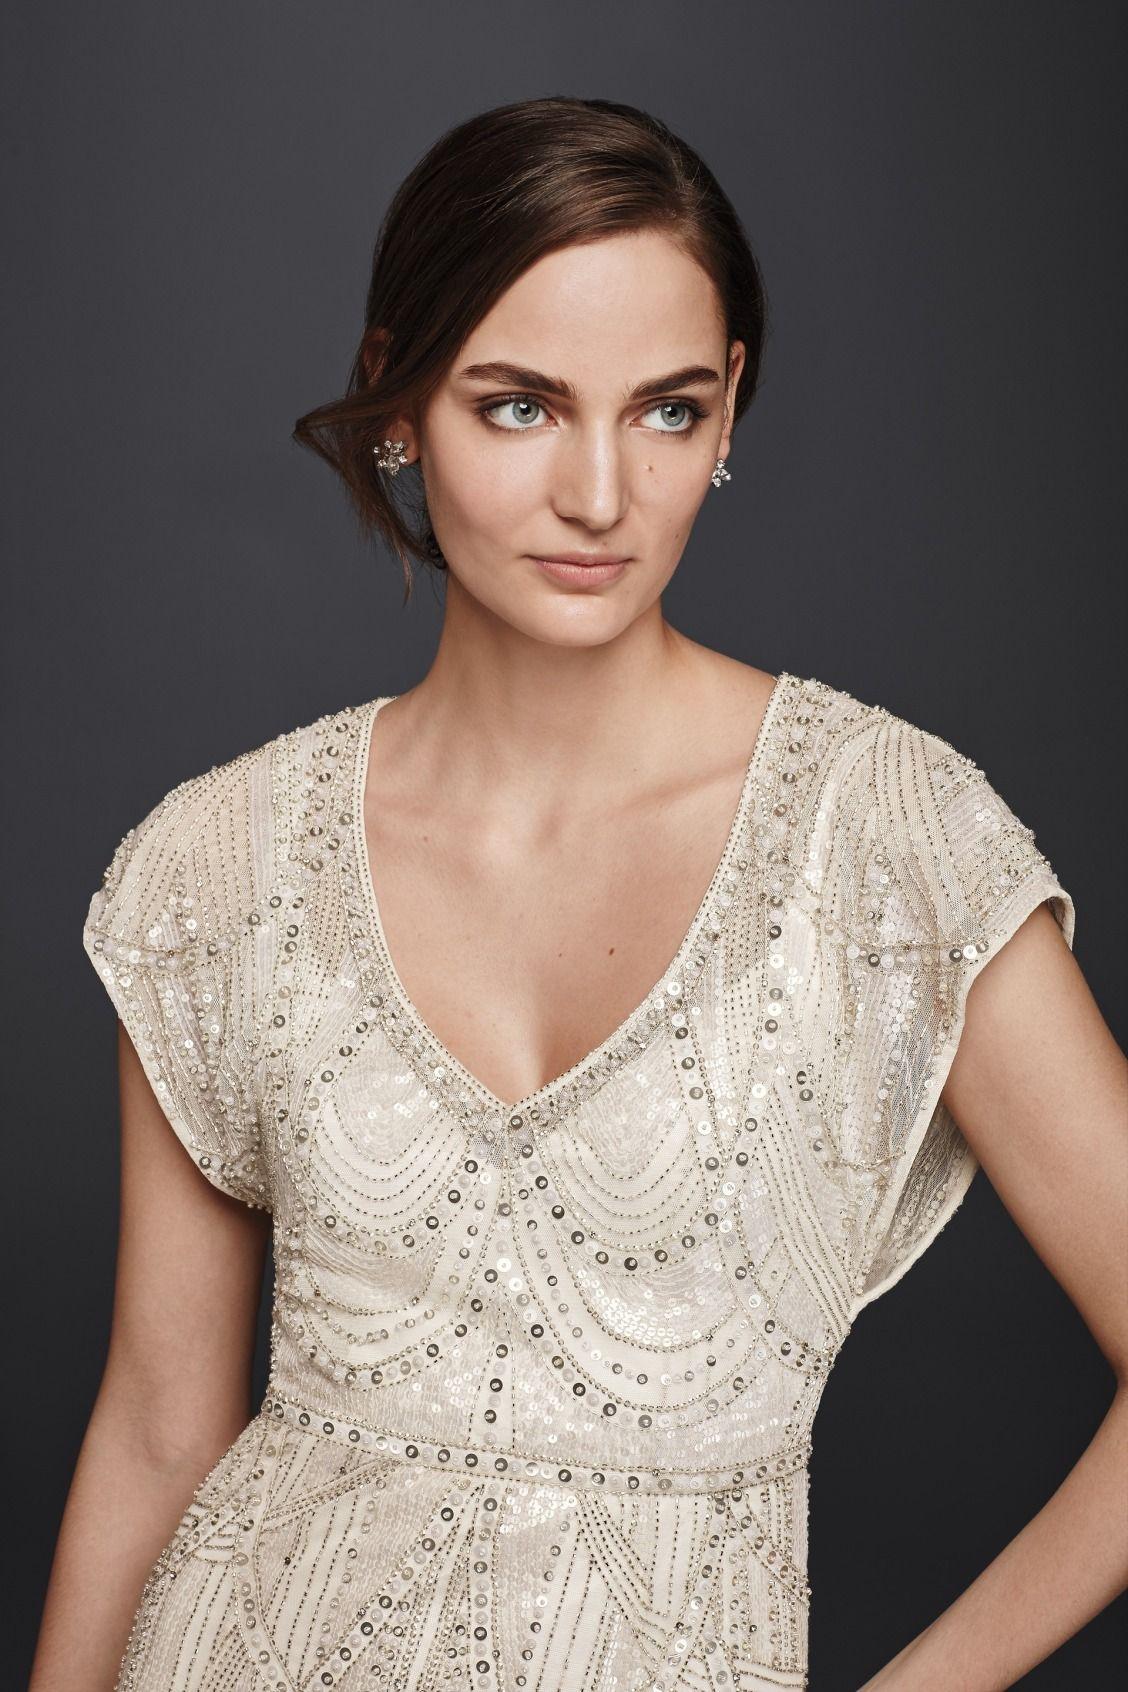 Jenny Packham Signature Beading Creates A Vintage Inspired Pattern Across The Short Sleeve Blouson Bodice Of This Mesh Sheath Wedding Dress